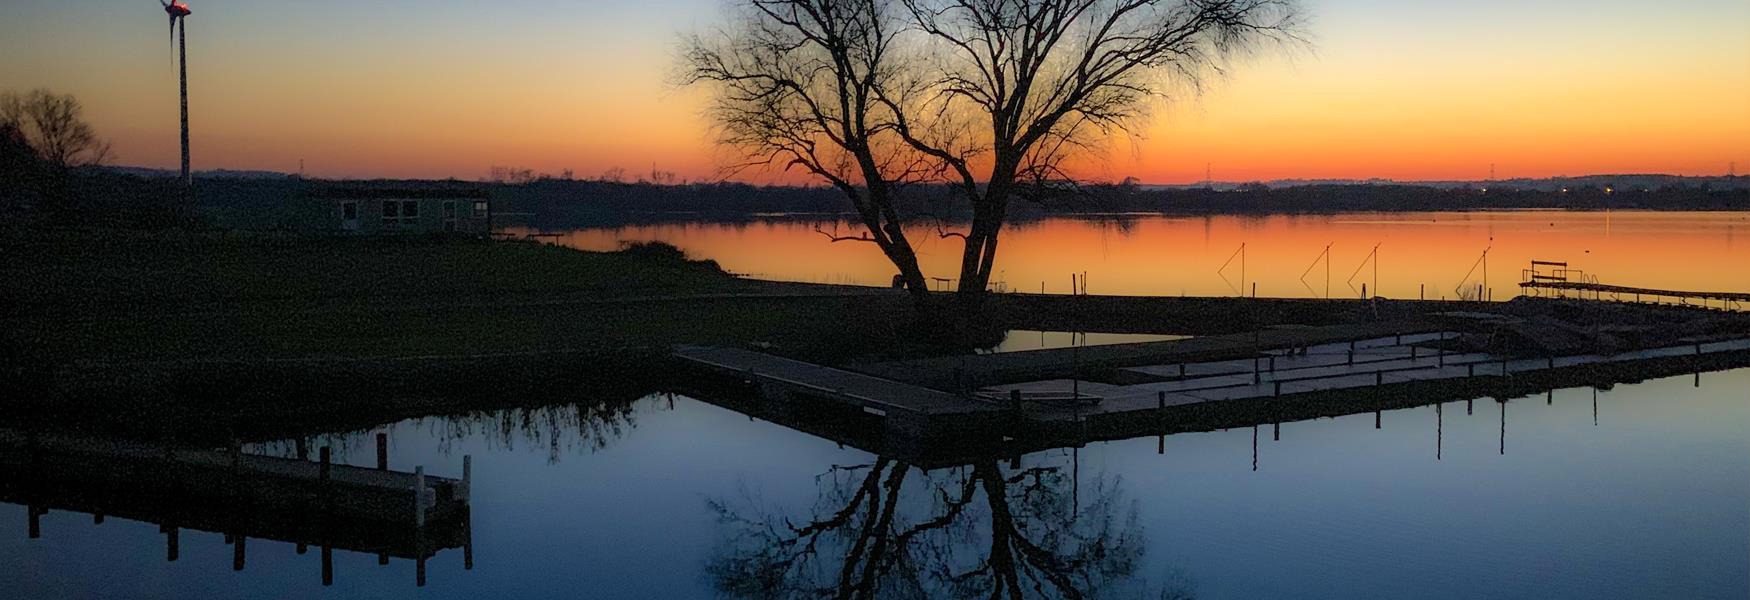 Stewartby Lake, Bedford. Photo by Robert Hill